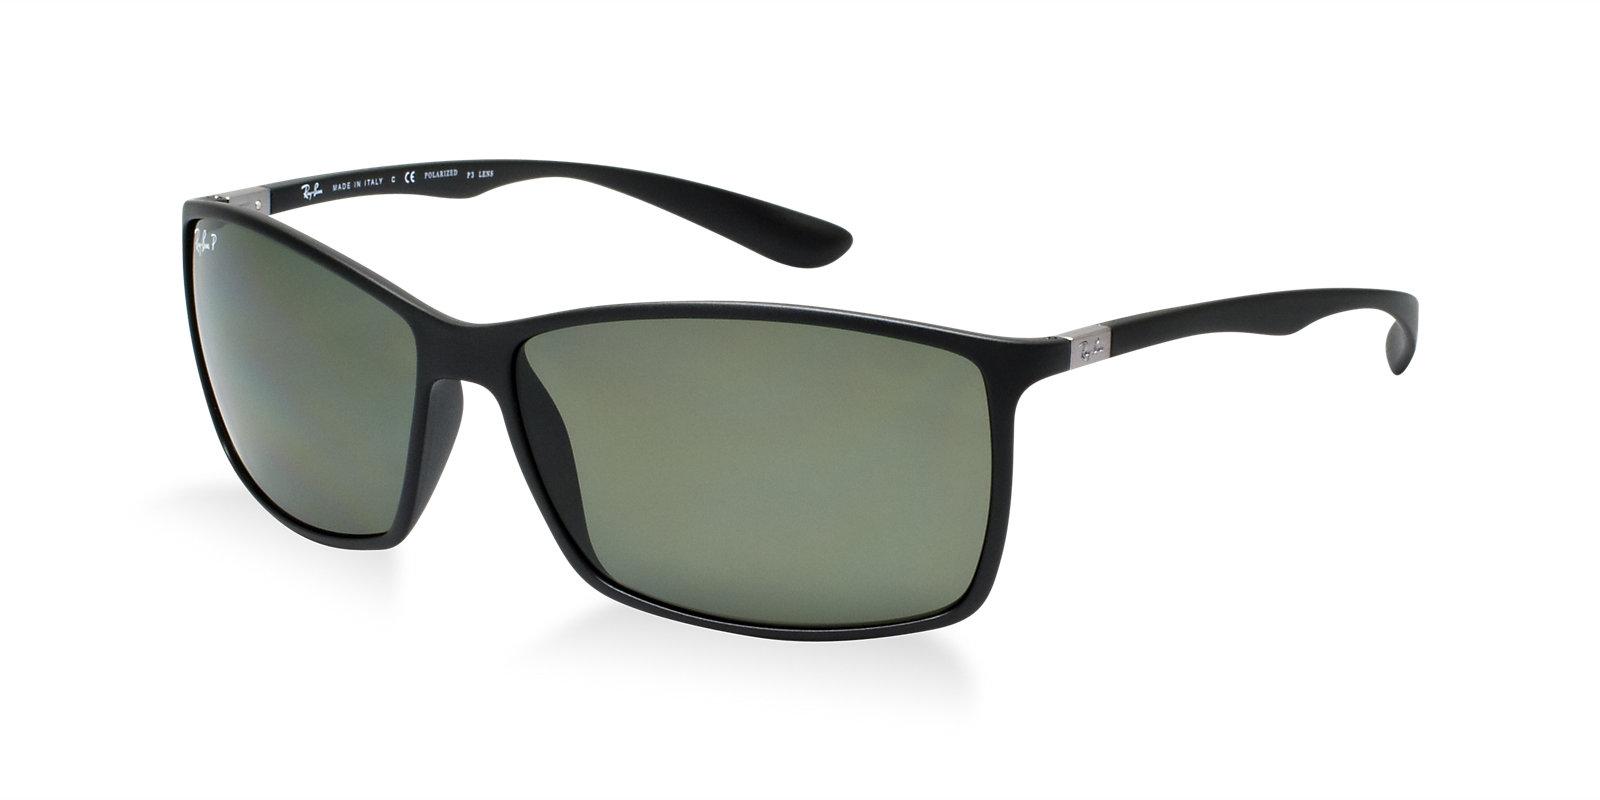 black polarized sunglasses p4g4  black polarized sunglasses